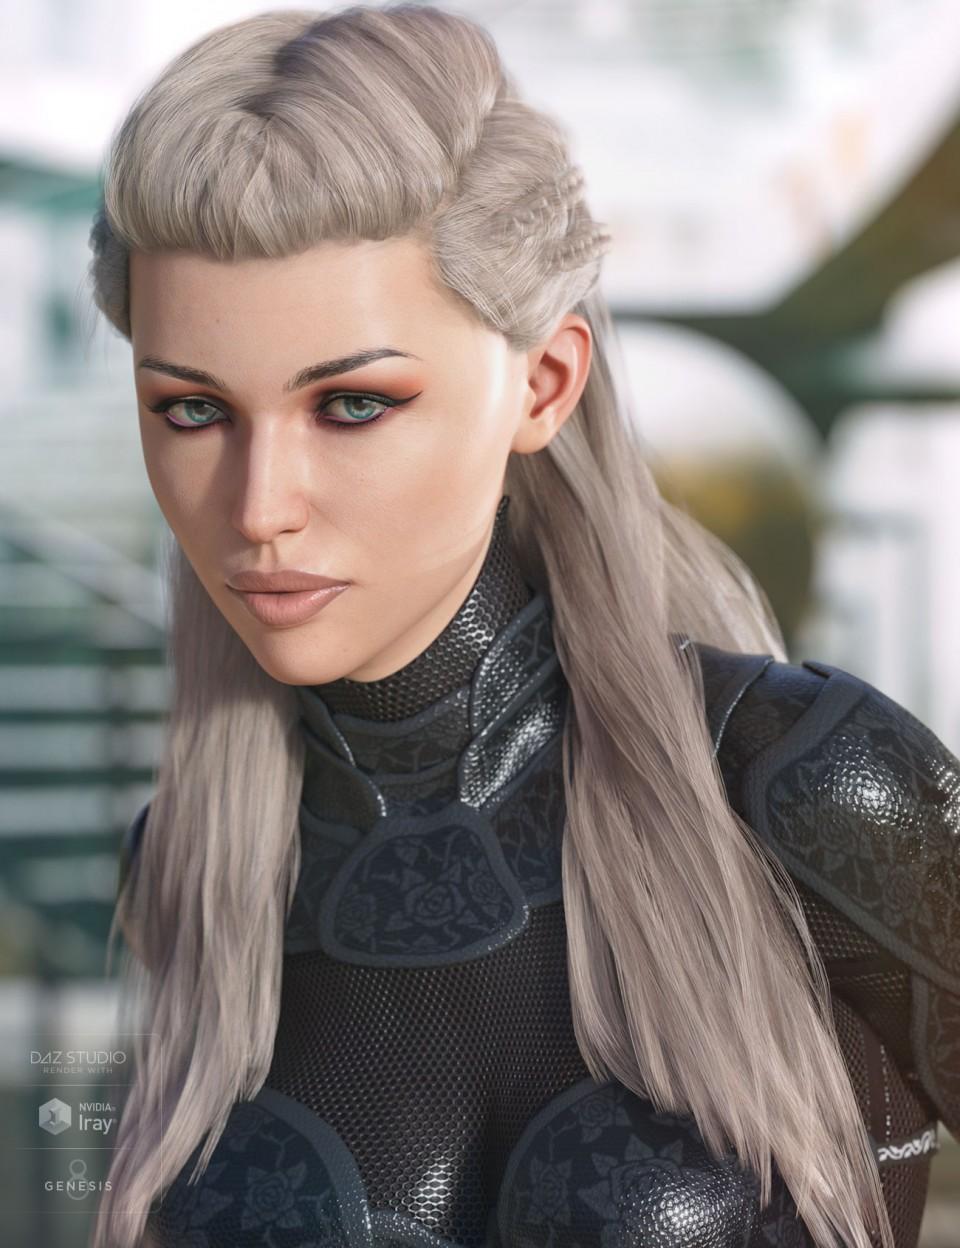 Evelyn Hair for Genesis 3 & 8 Female(s)